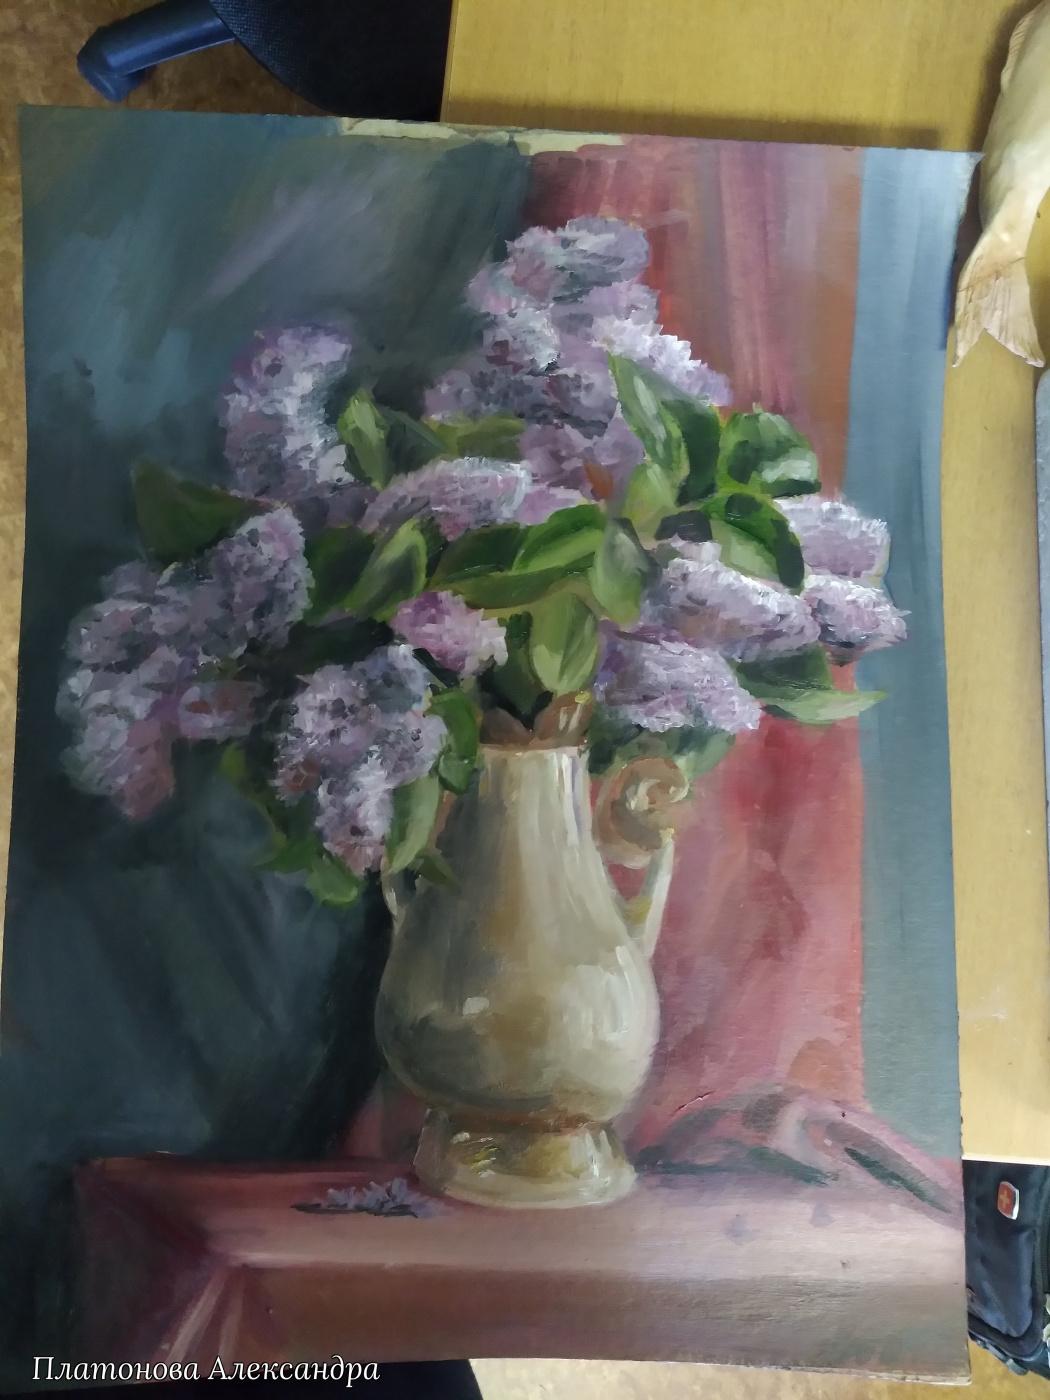 Platonova Alexandra. Lilac study